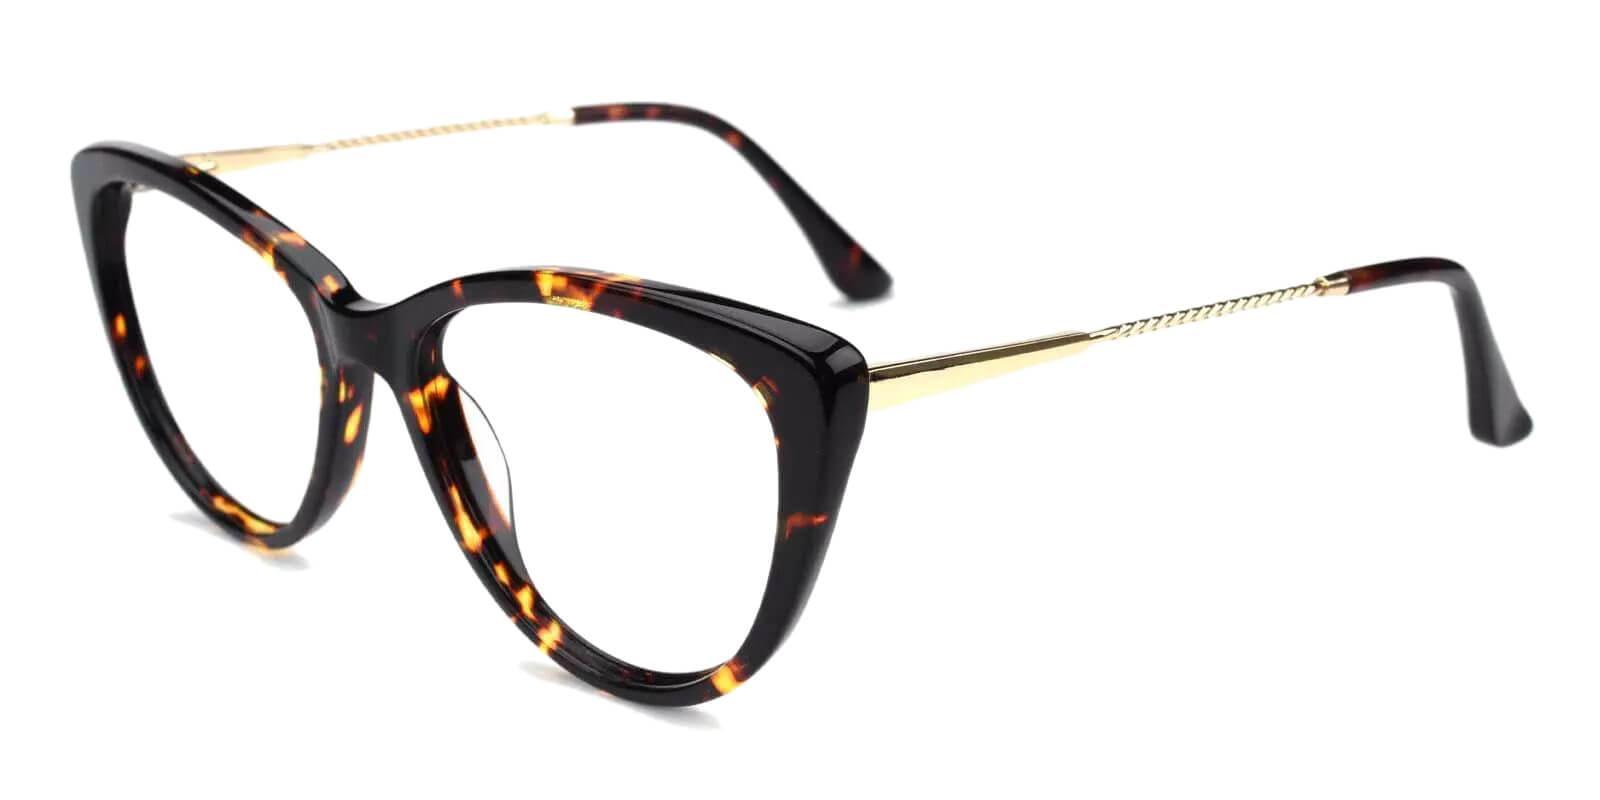 Satin Tortoise Acetate , Metal Eyeglasses , Fashion , SpringHinges , UniversalBridgeFit Frames from ABBE Glasses